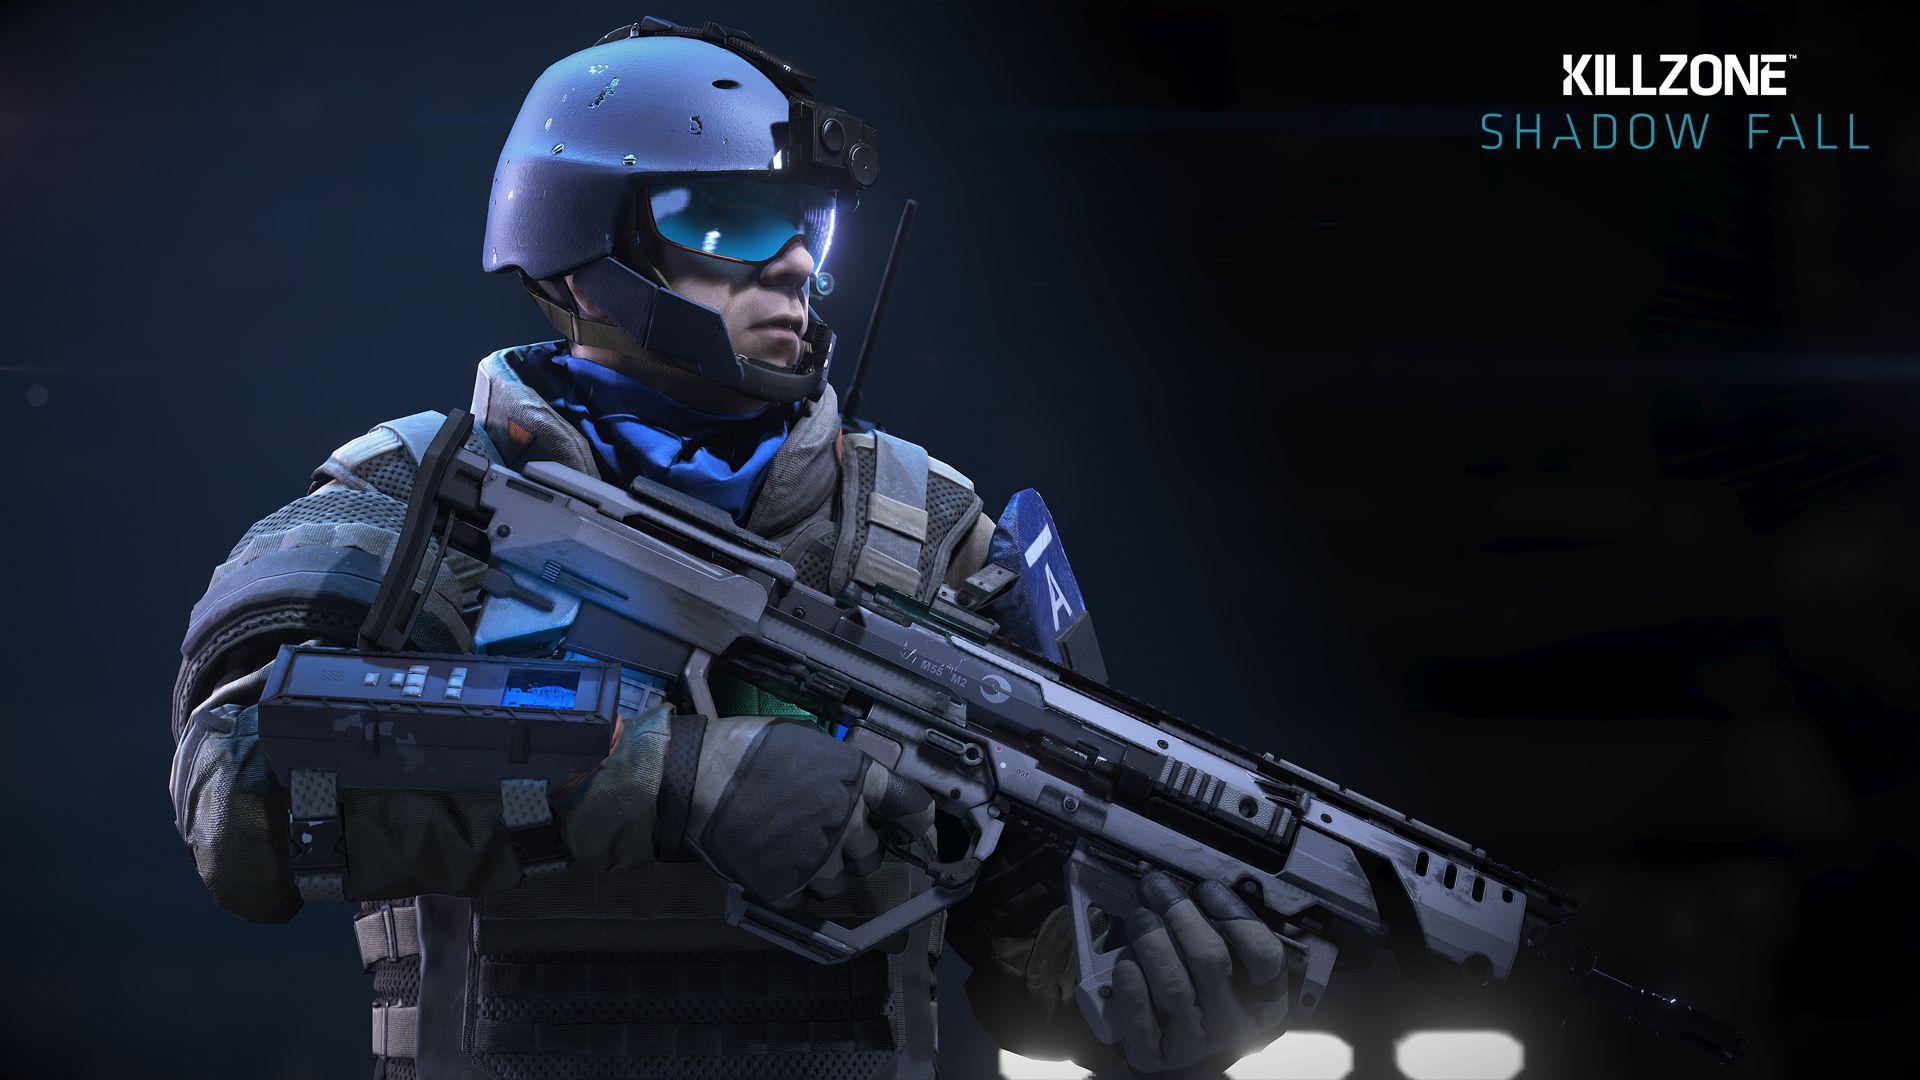 Killzone shadow fall assault multiplayer class gets full details killzone shadow fall assault image voltagebd Gallery